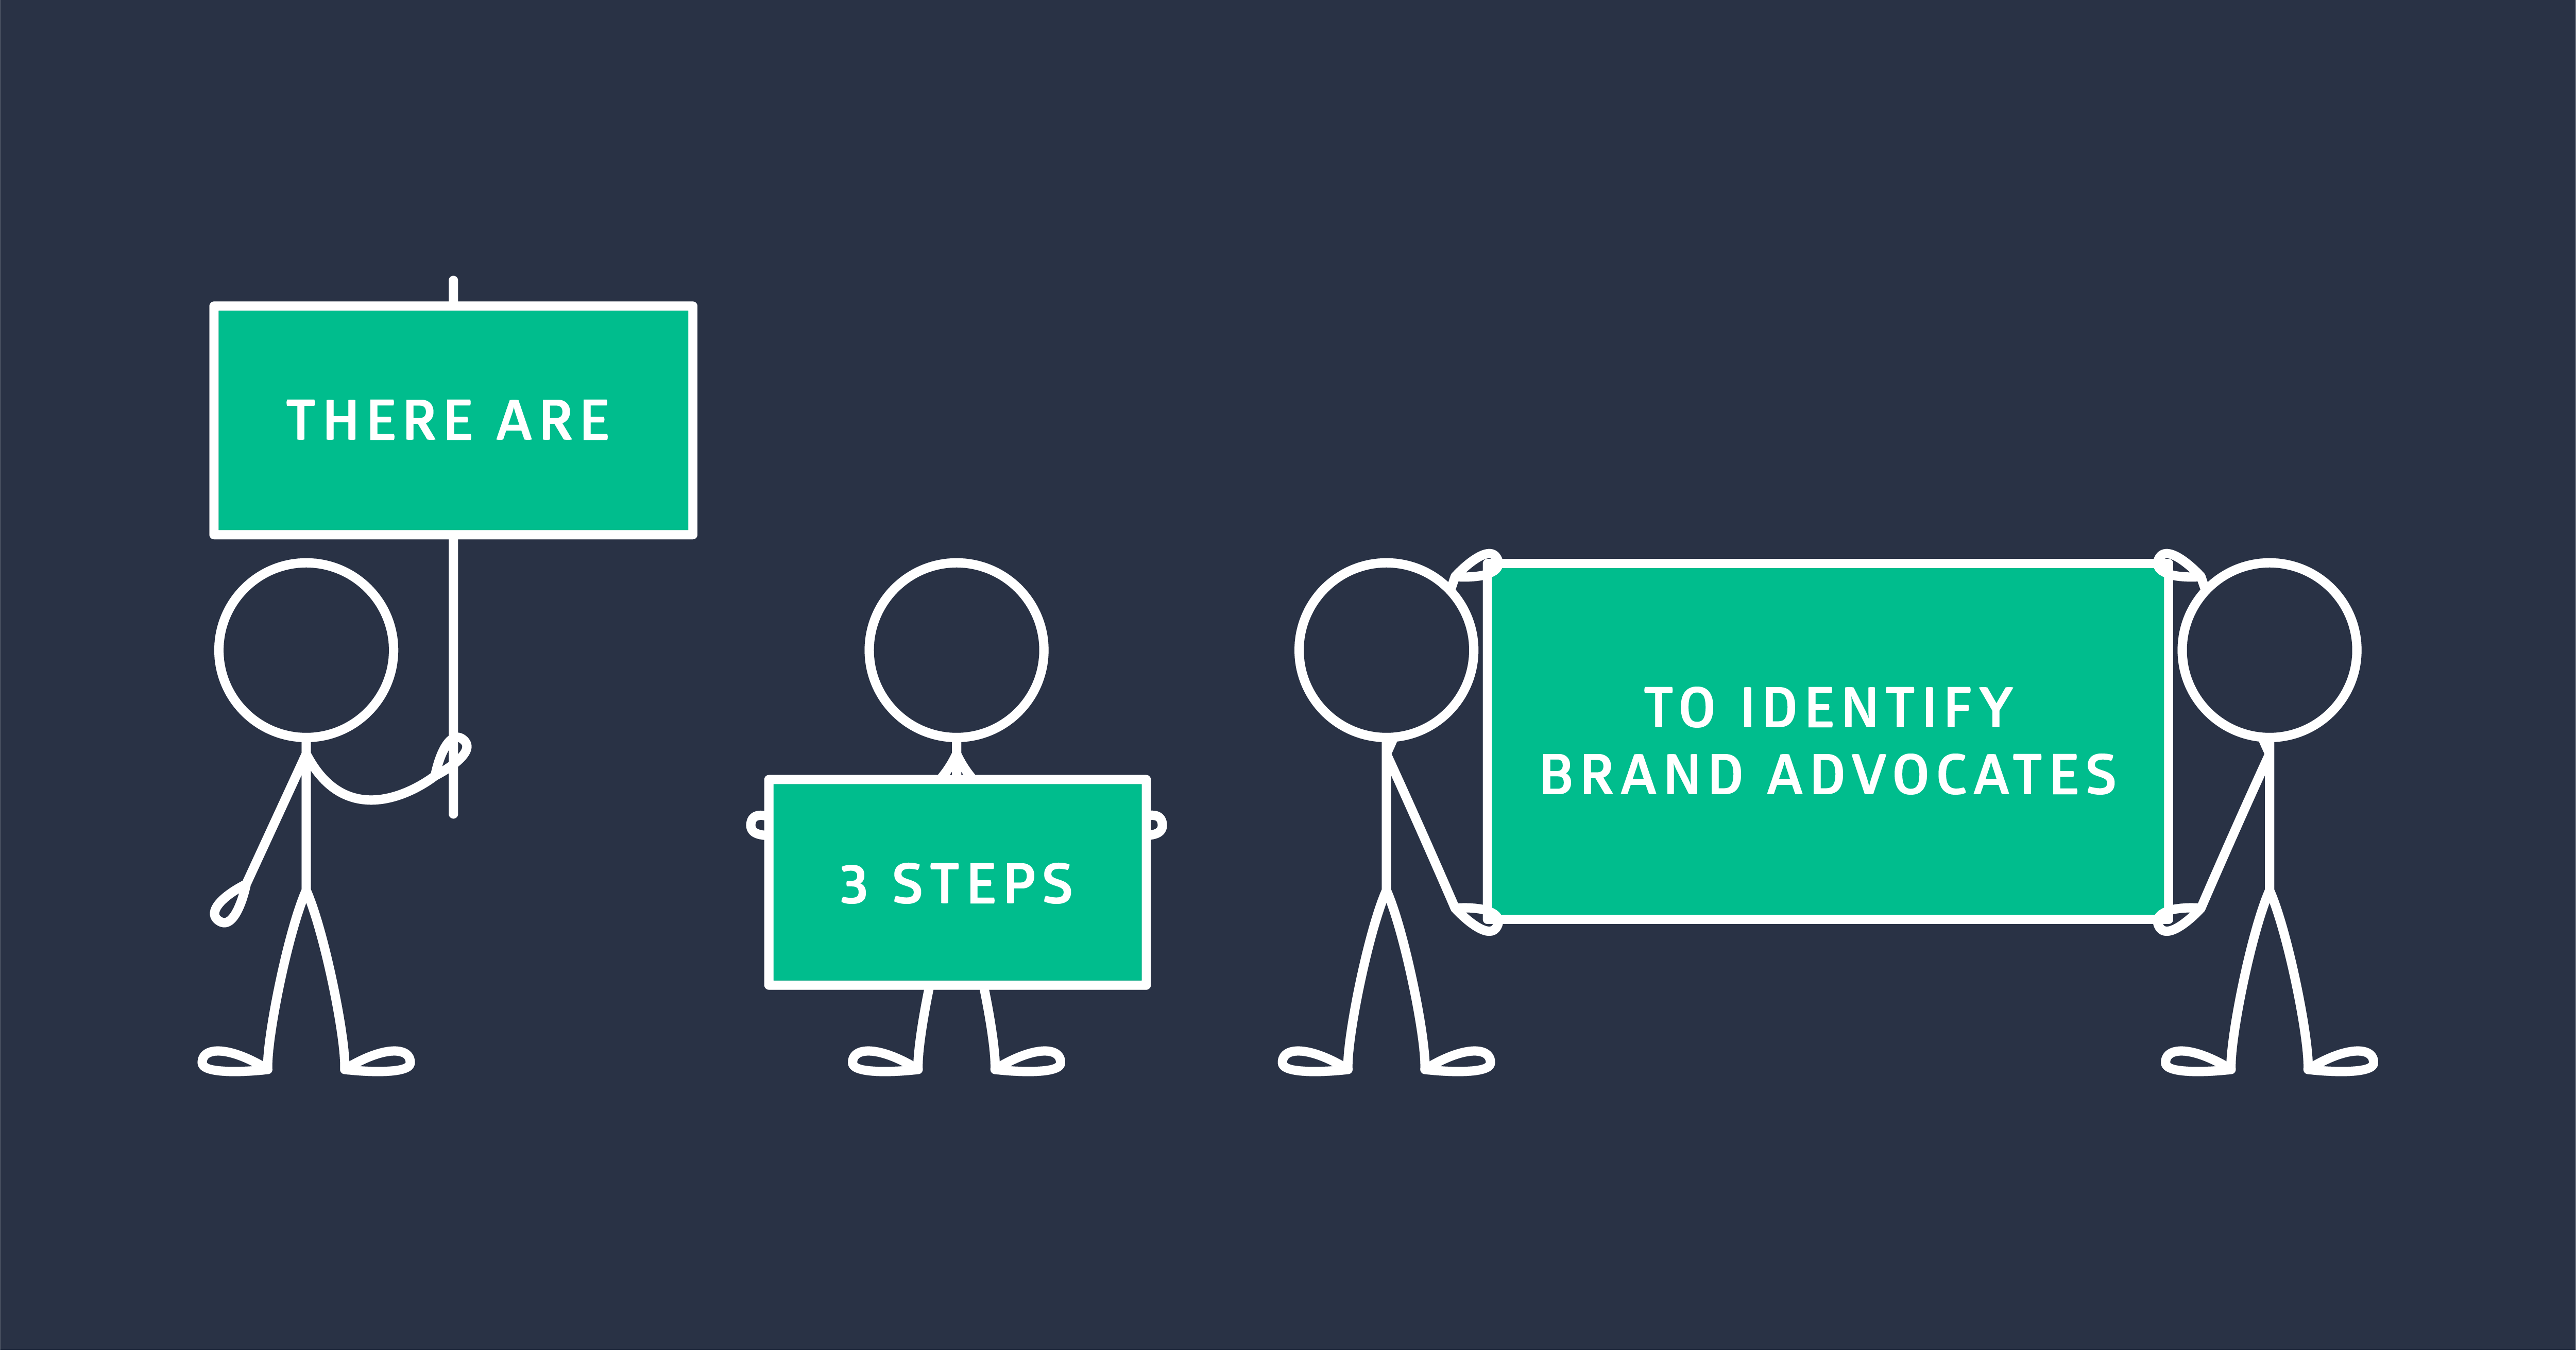 3 Steps To Identify Brand Advocates